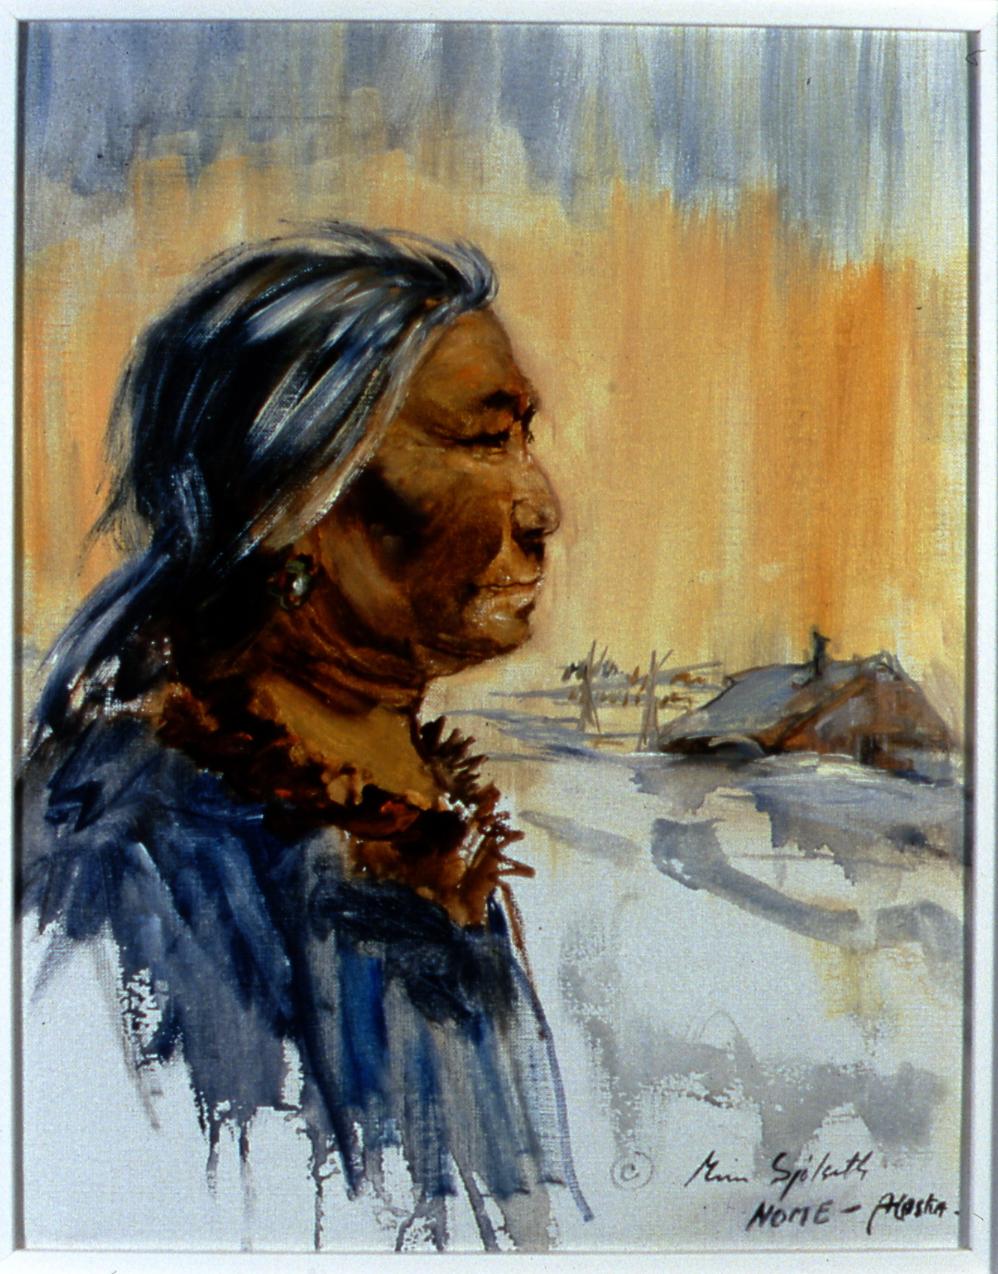 "Teresa,  1982,  Minn Sjølseth, oil on canvas, 13 1/2"" x 10 1/2"", 2000.04.01, gift of Al and Laila Campbell"